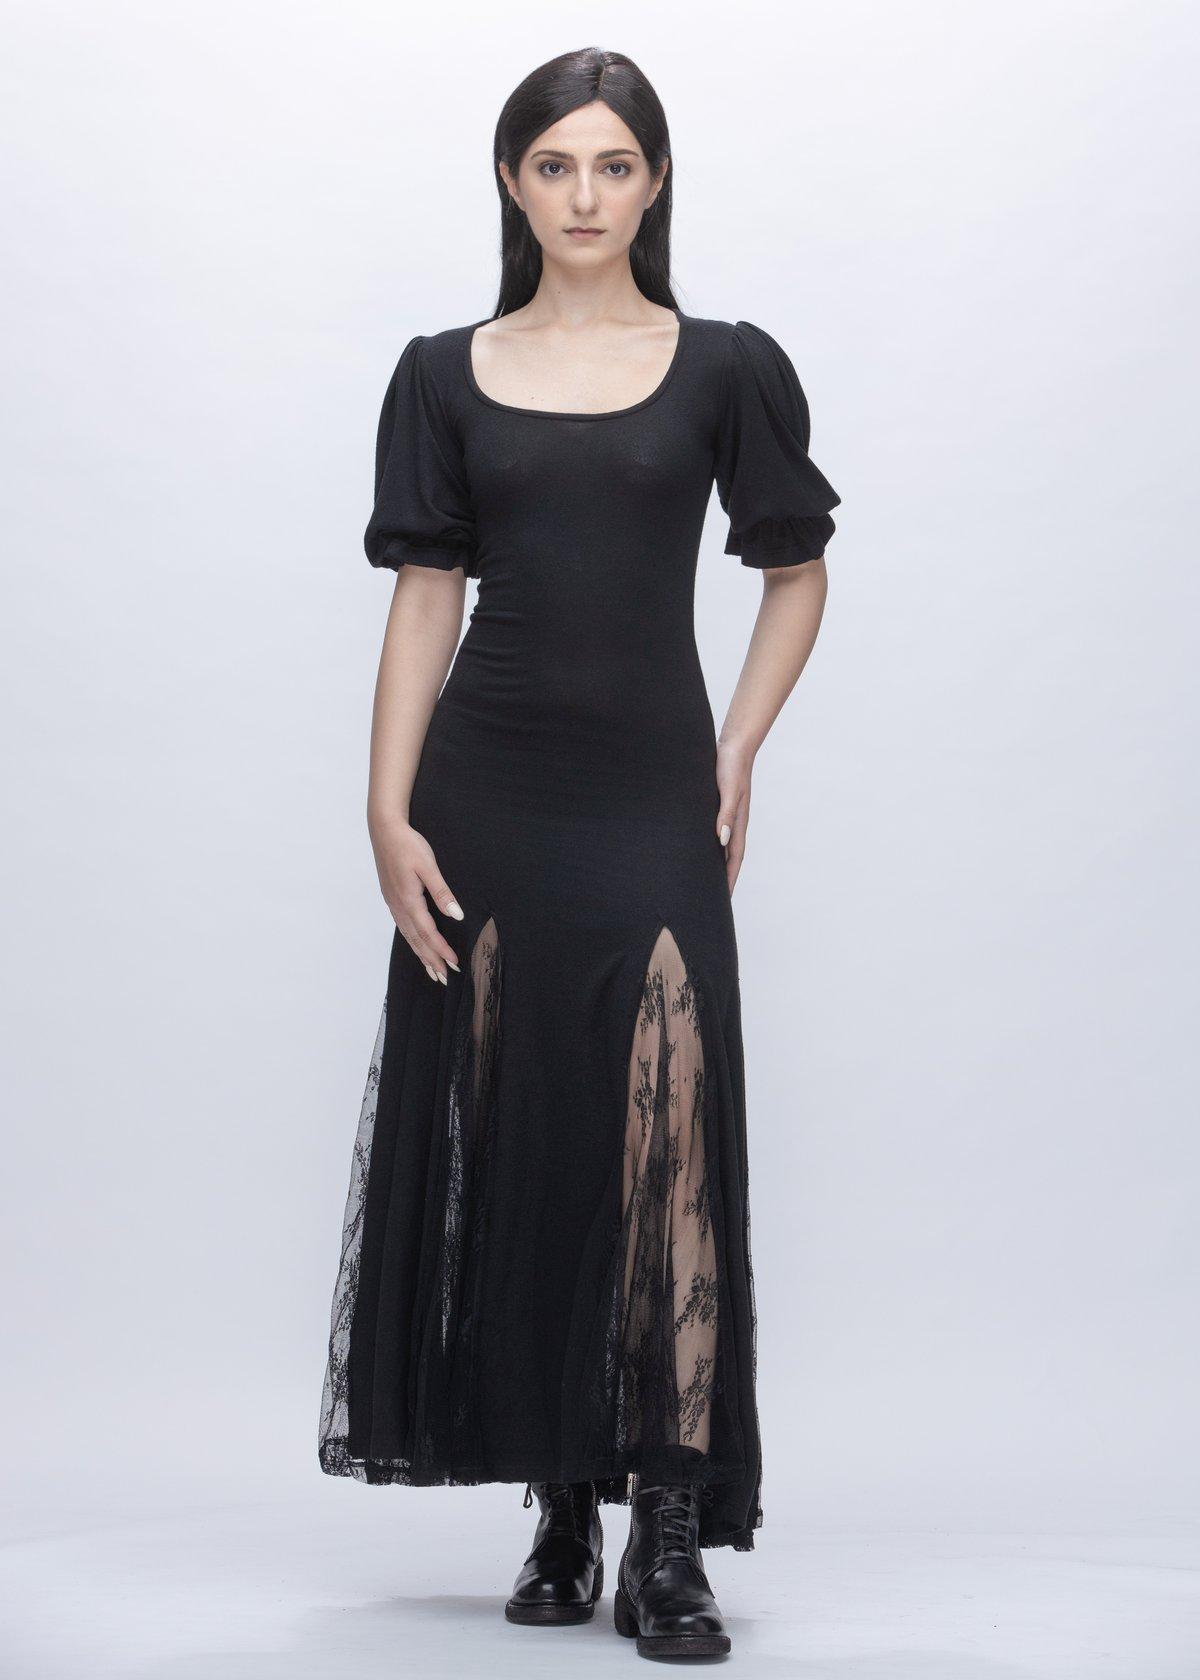 Image of Pamela Embroidered Lace Dress